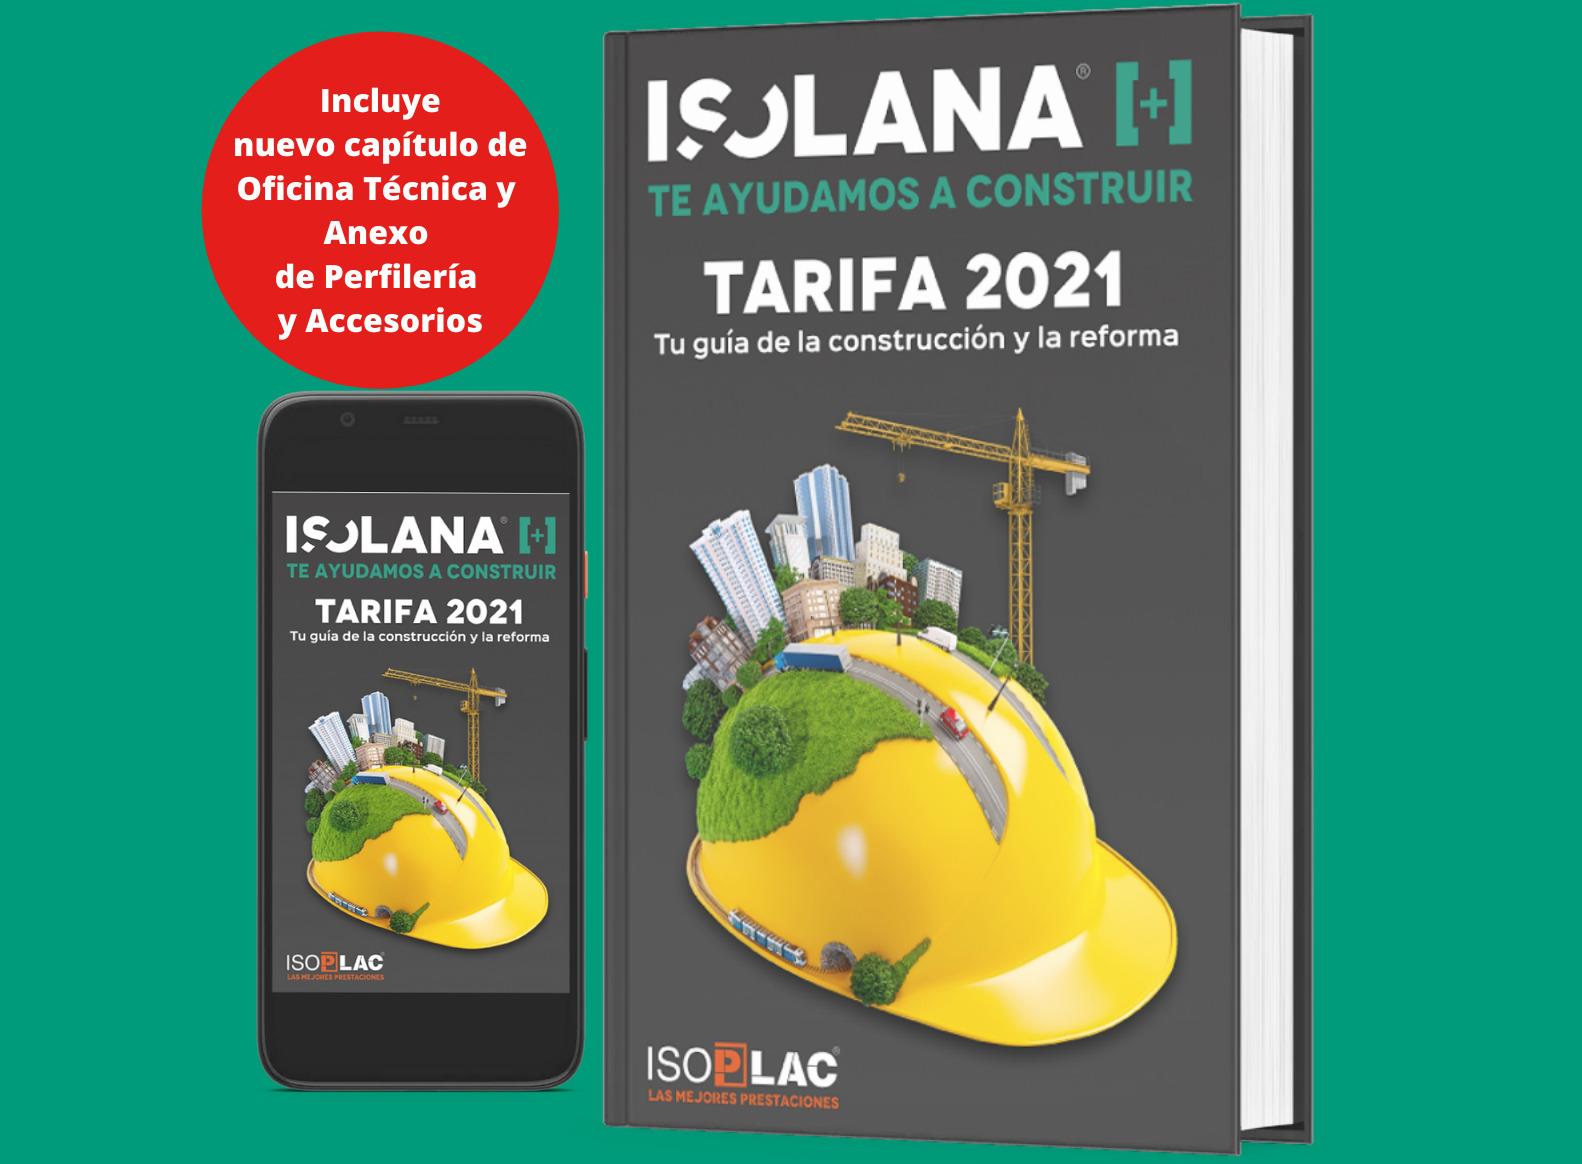 Tarifa Isolana 2021 online